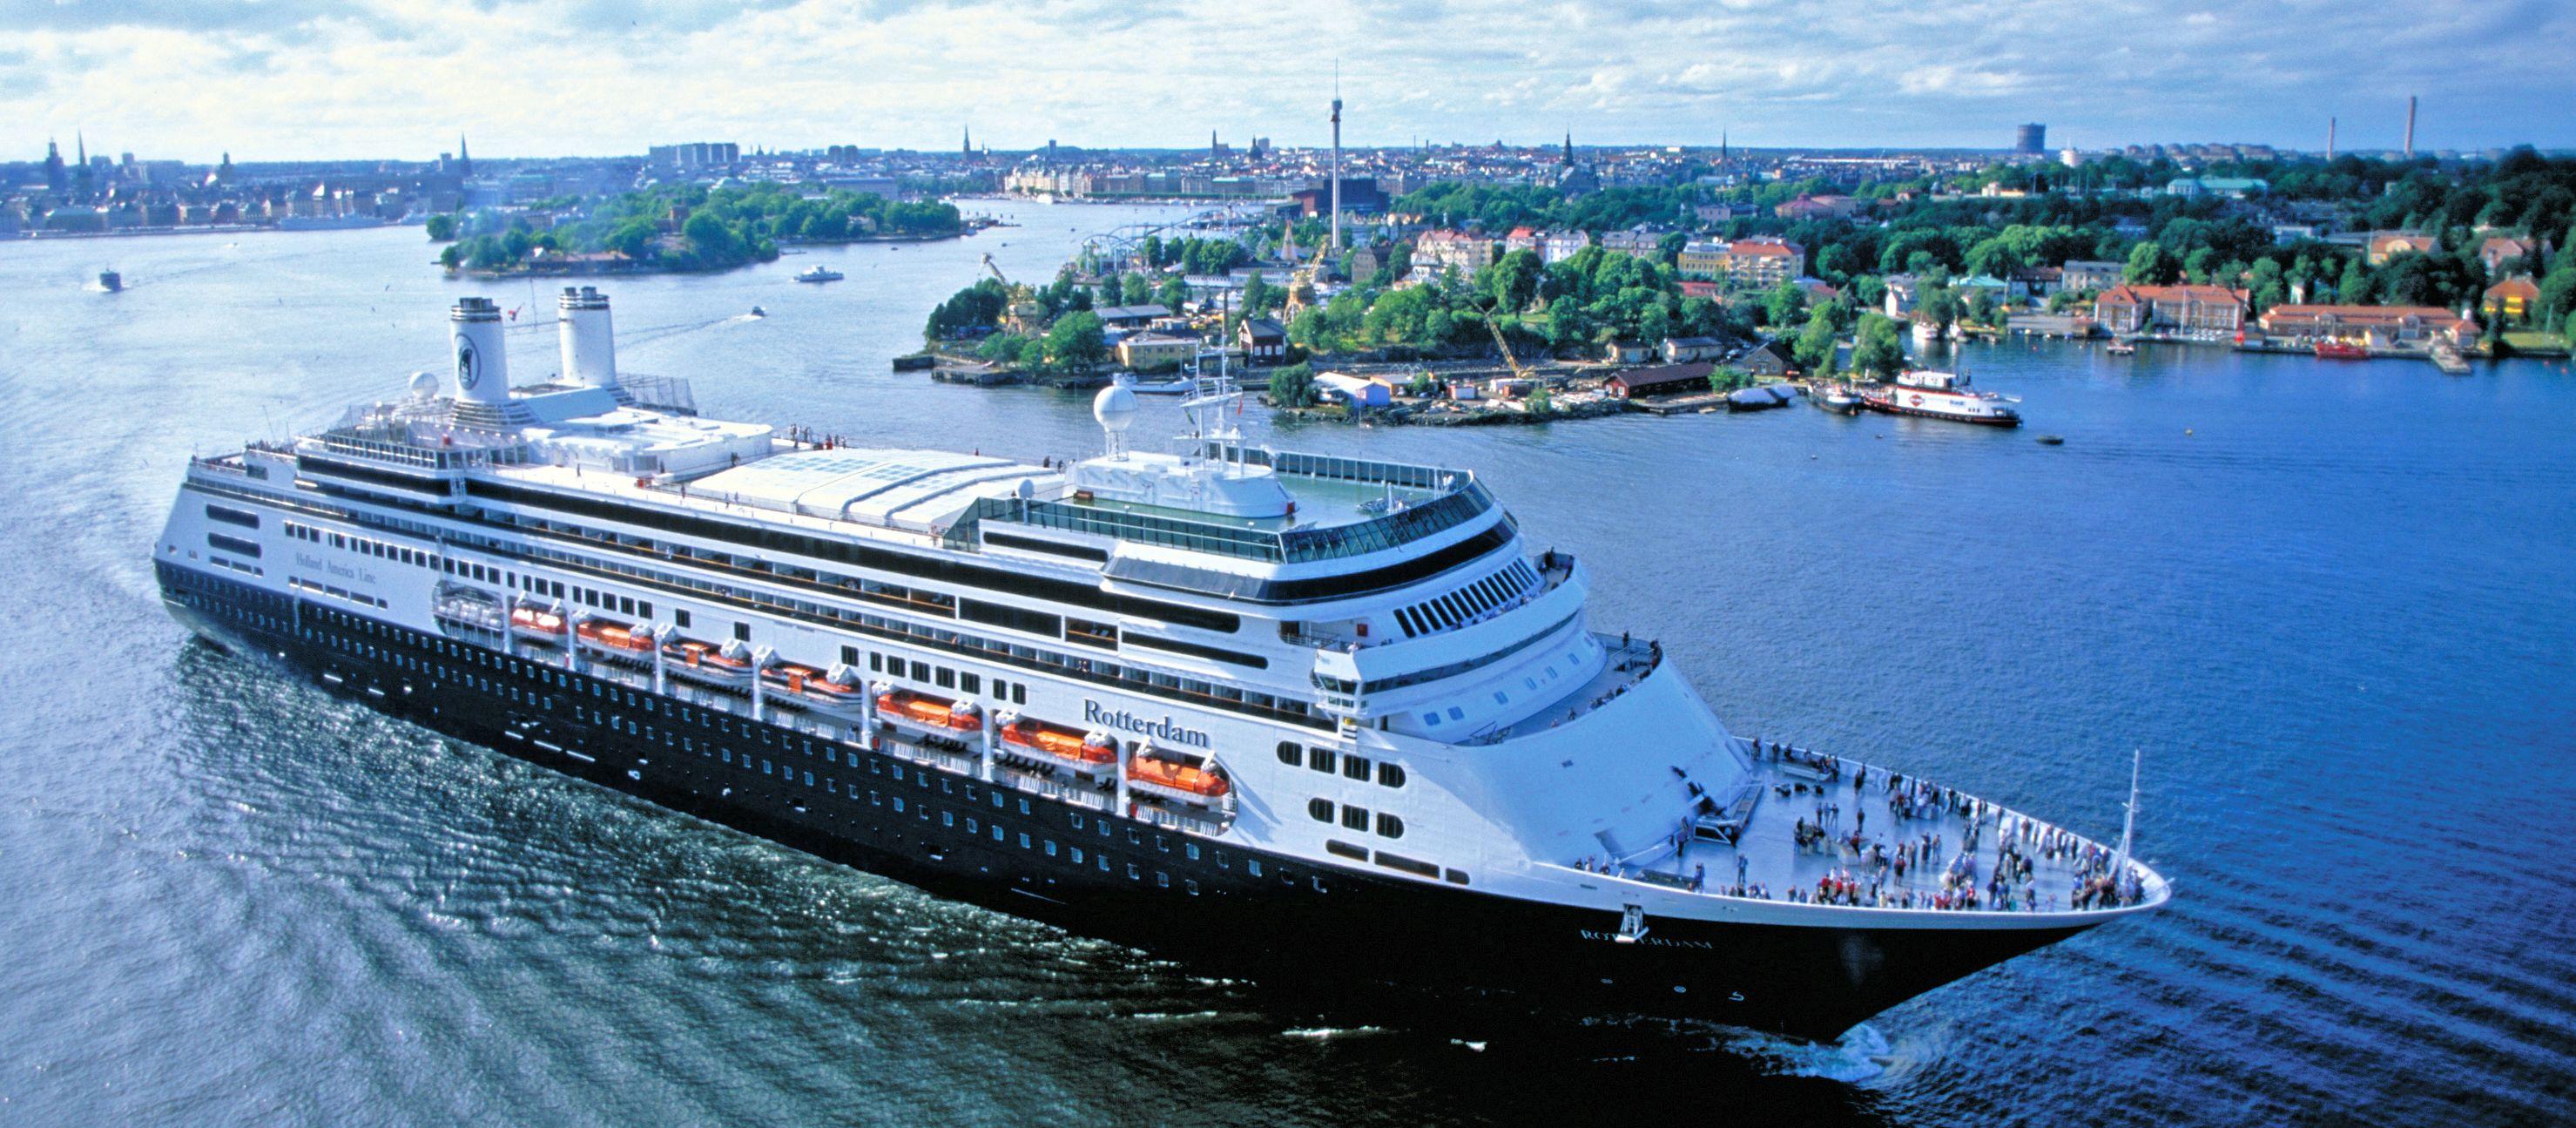 Impression Rotterdam